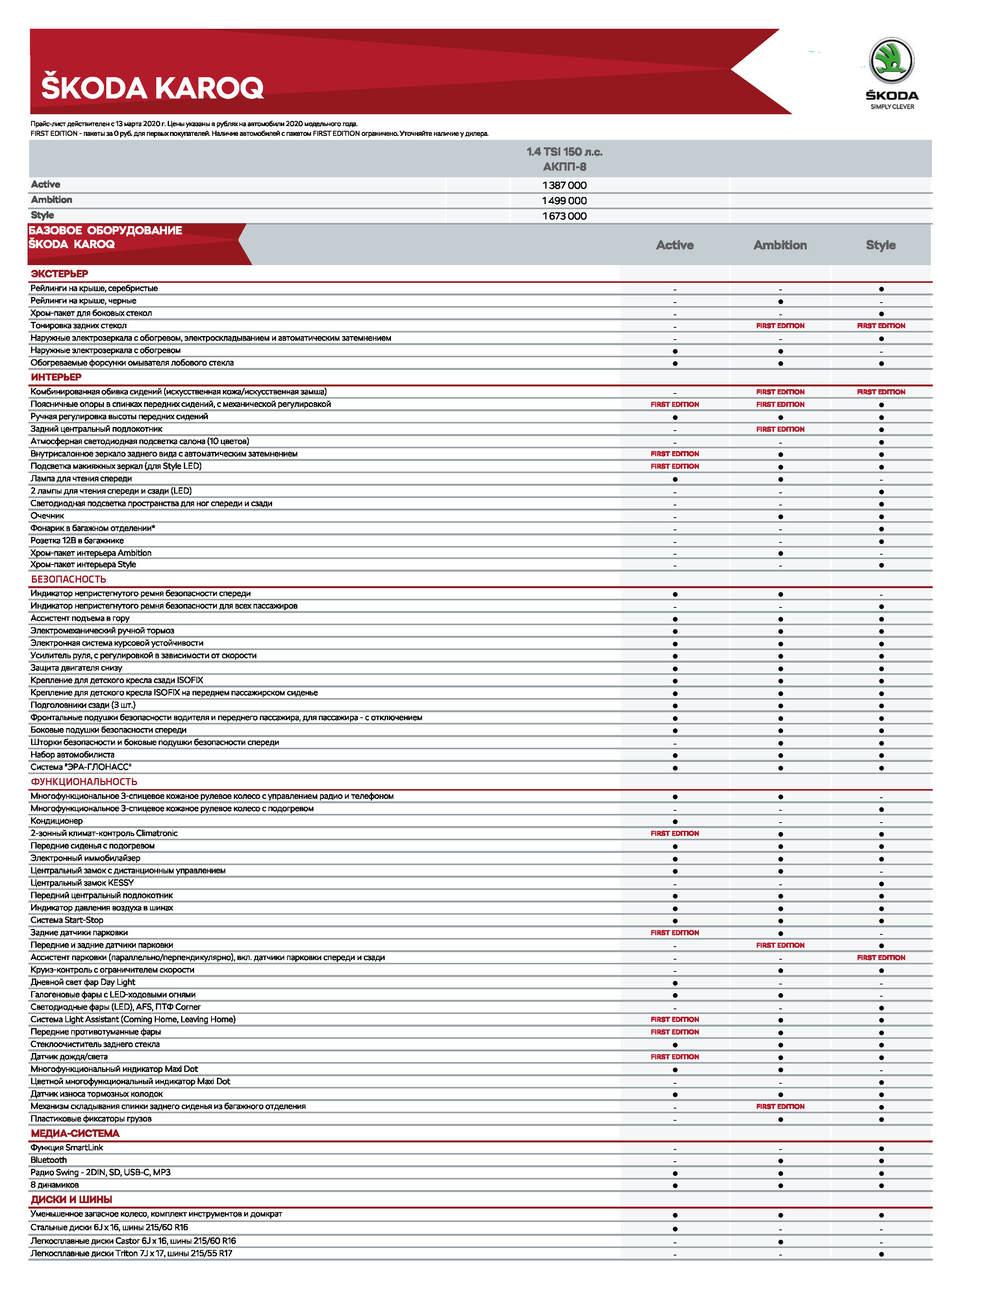 karoq-price-list-active-new_Page_1.jpg